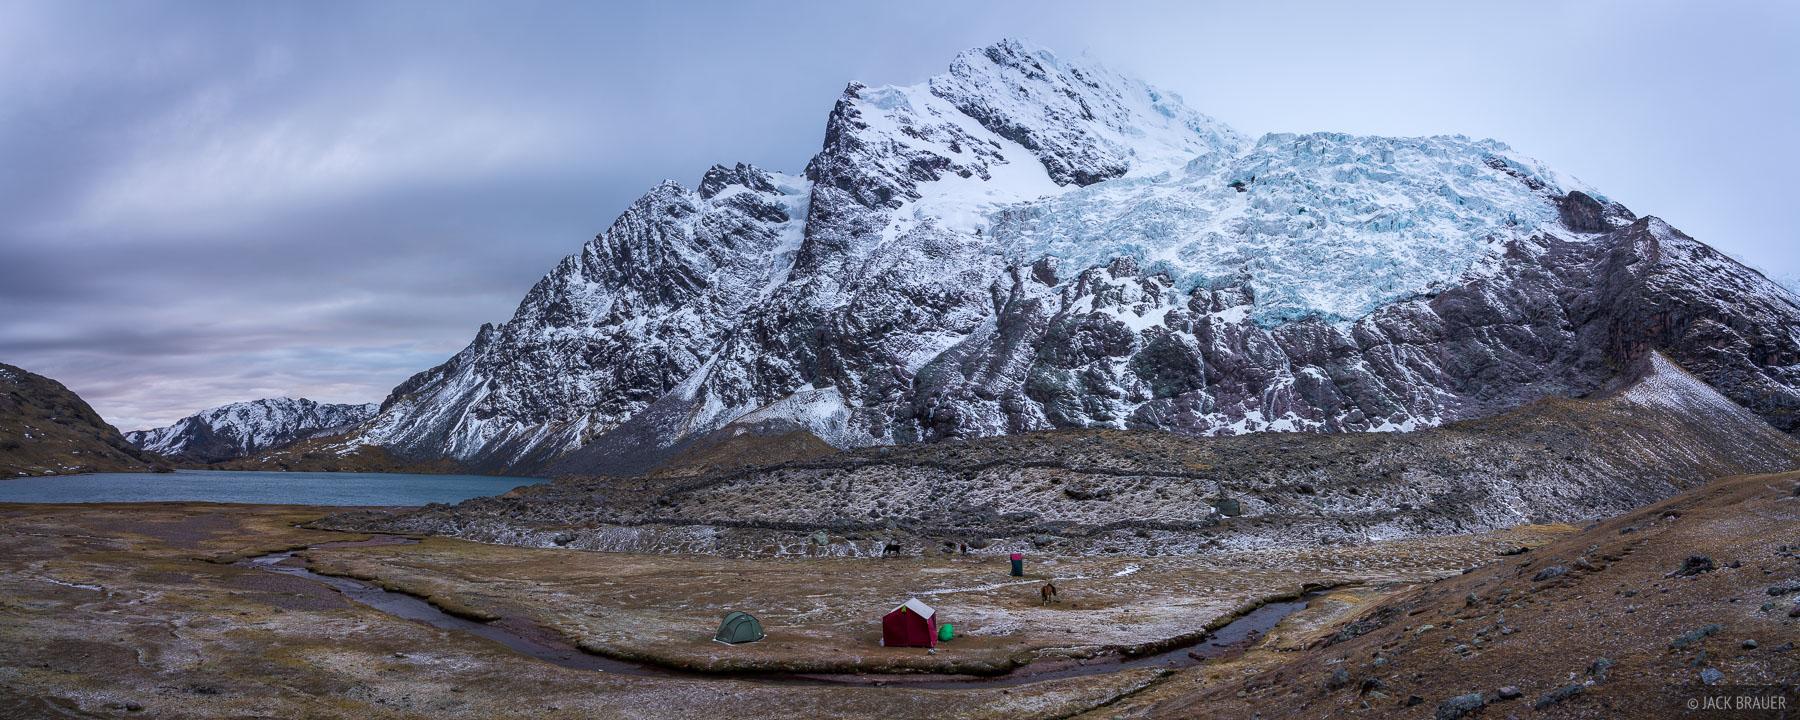 Ausangate, Cordillera Vilcanota, Lago Jatun Pucacocha, Peru, South America, tent, photo